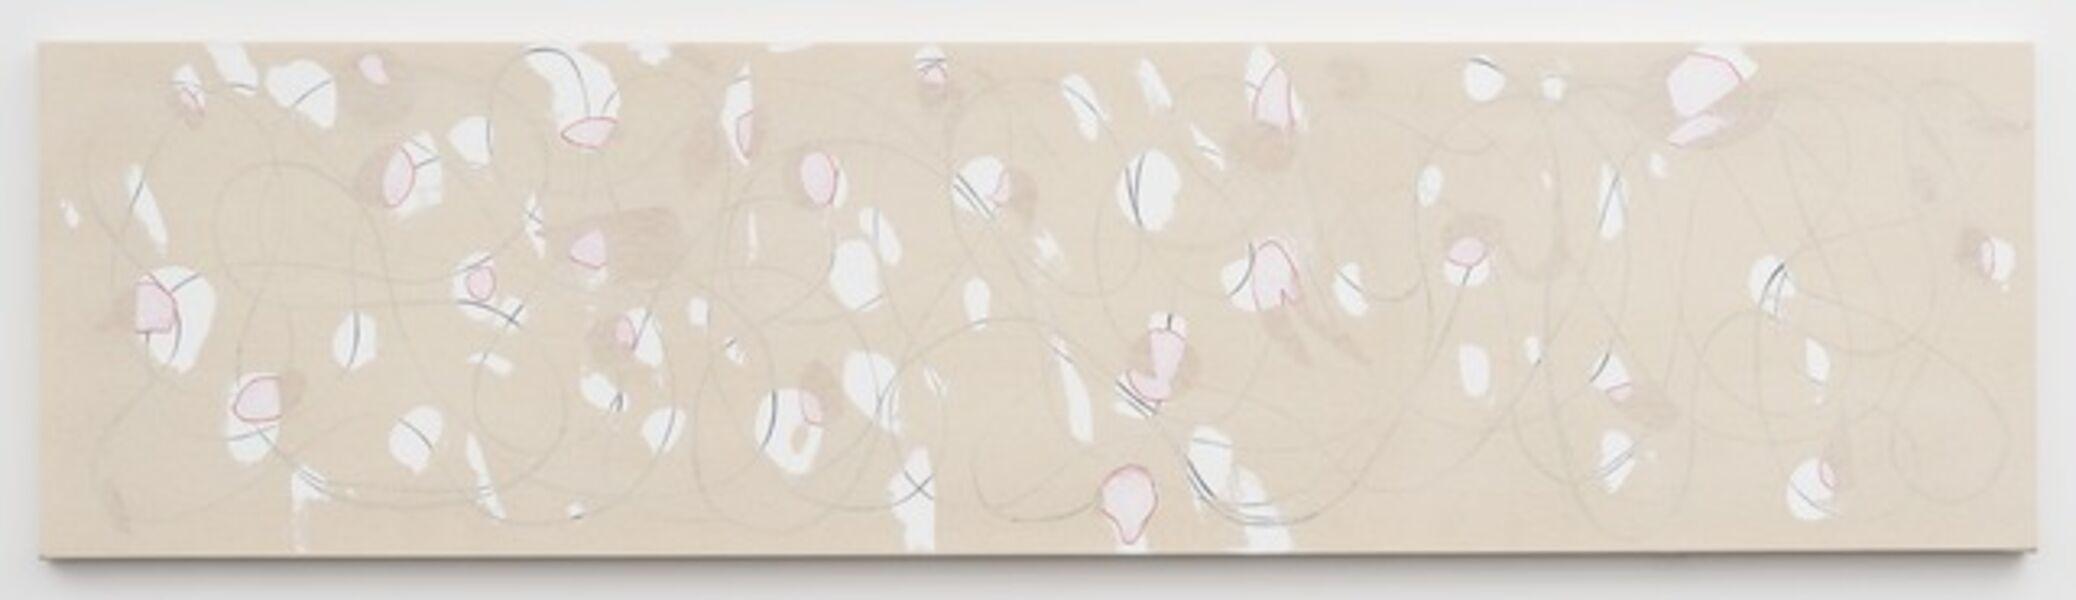 Zak Prekop, 'Transparency with Drawing 2', 2015